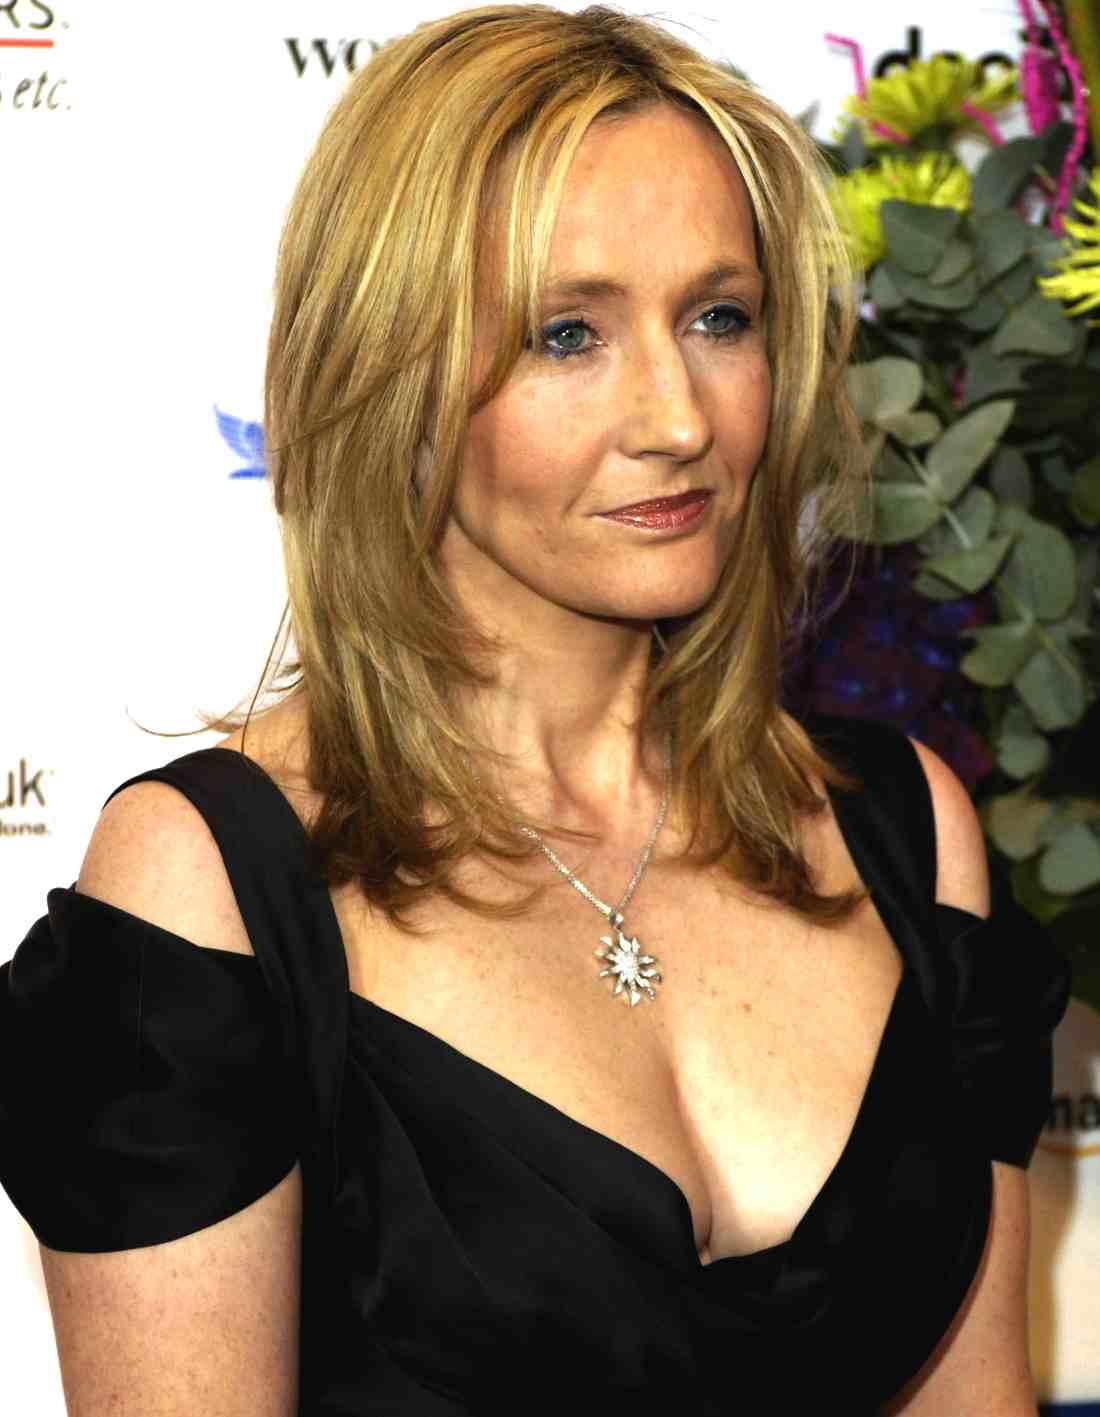 Jk Rowling Jessica Arantes J k